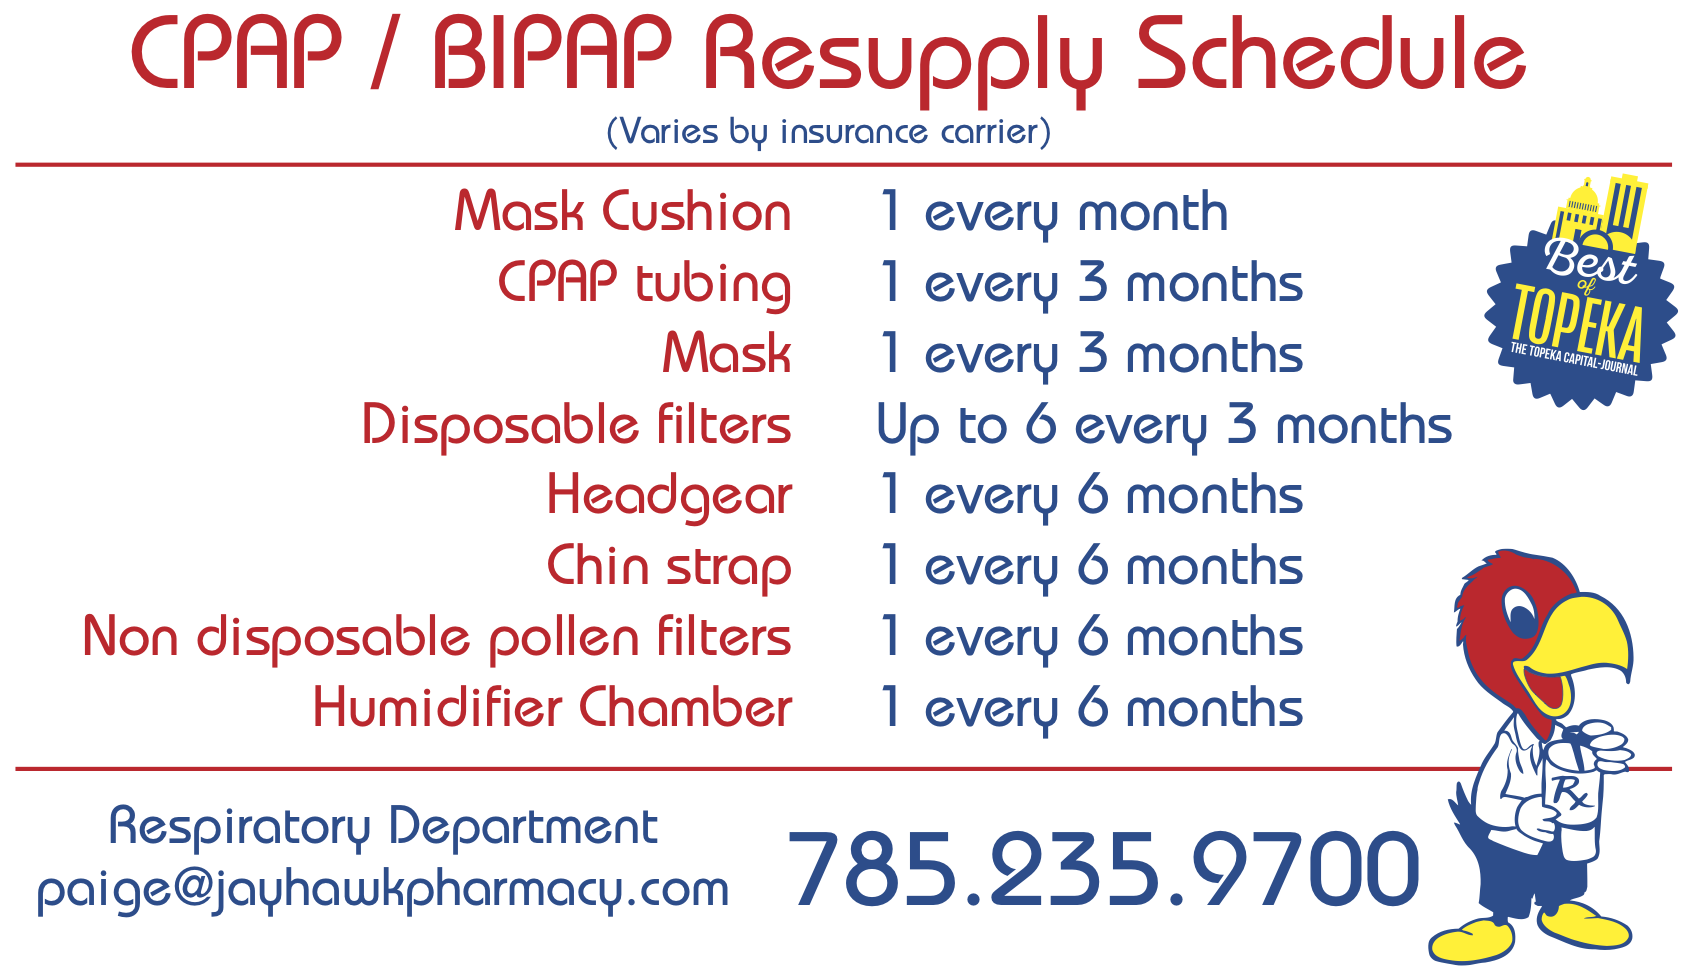 CPAP Refill - Jayhawk Pharmacy & Patient Supply